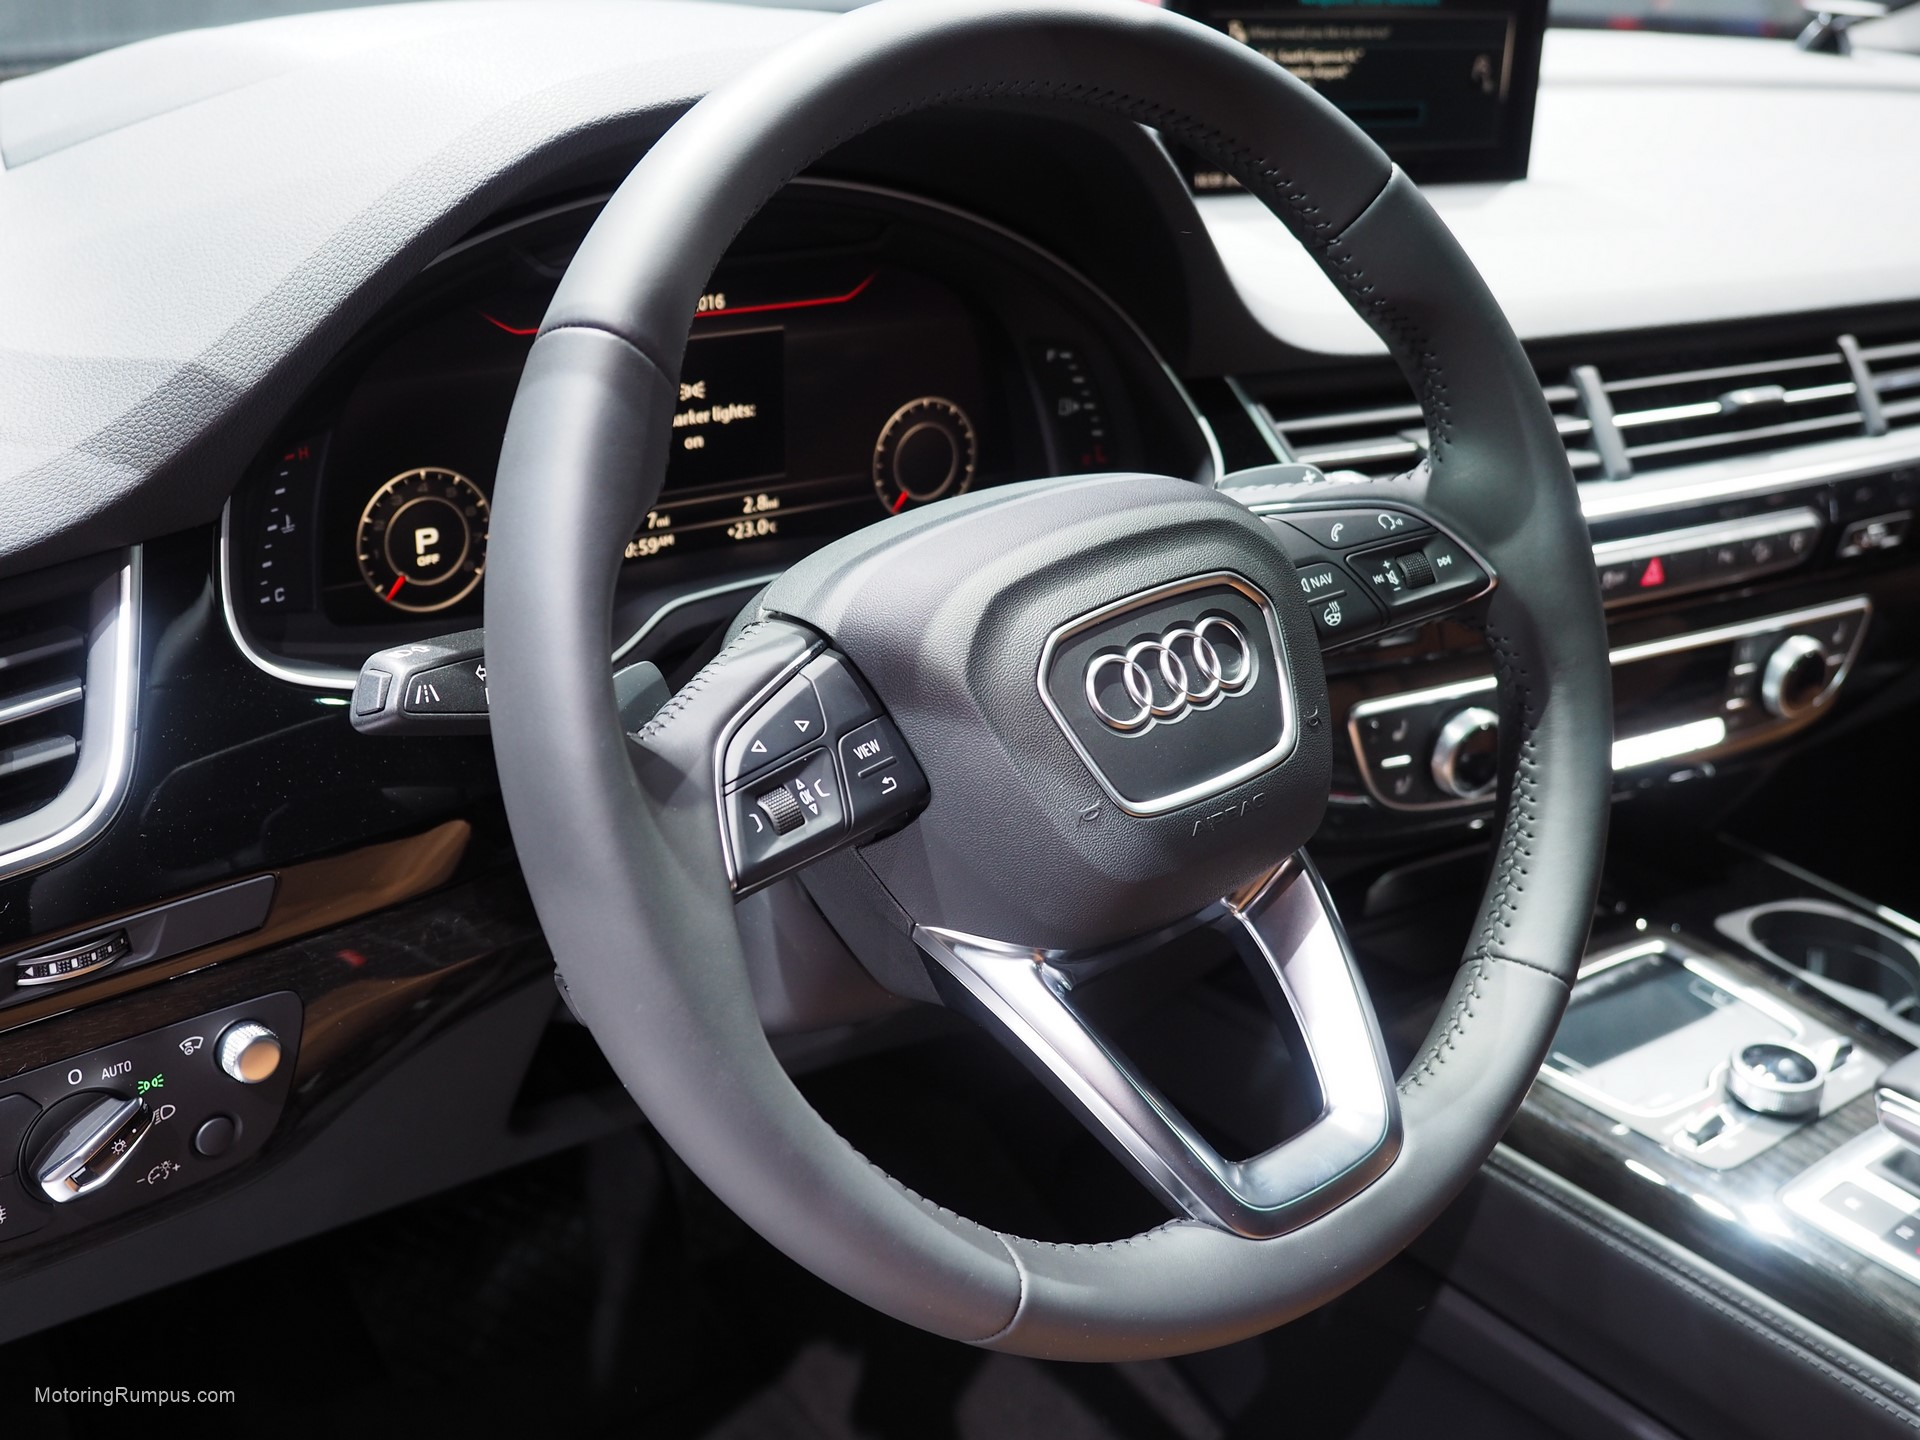 2016 NAIAS Audi Q7 Steering Wheel